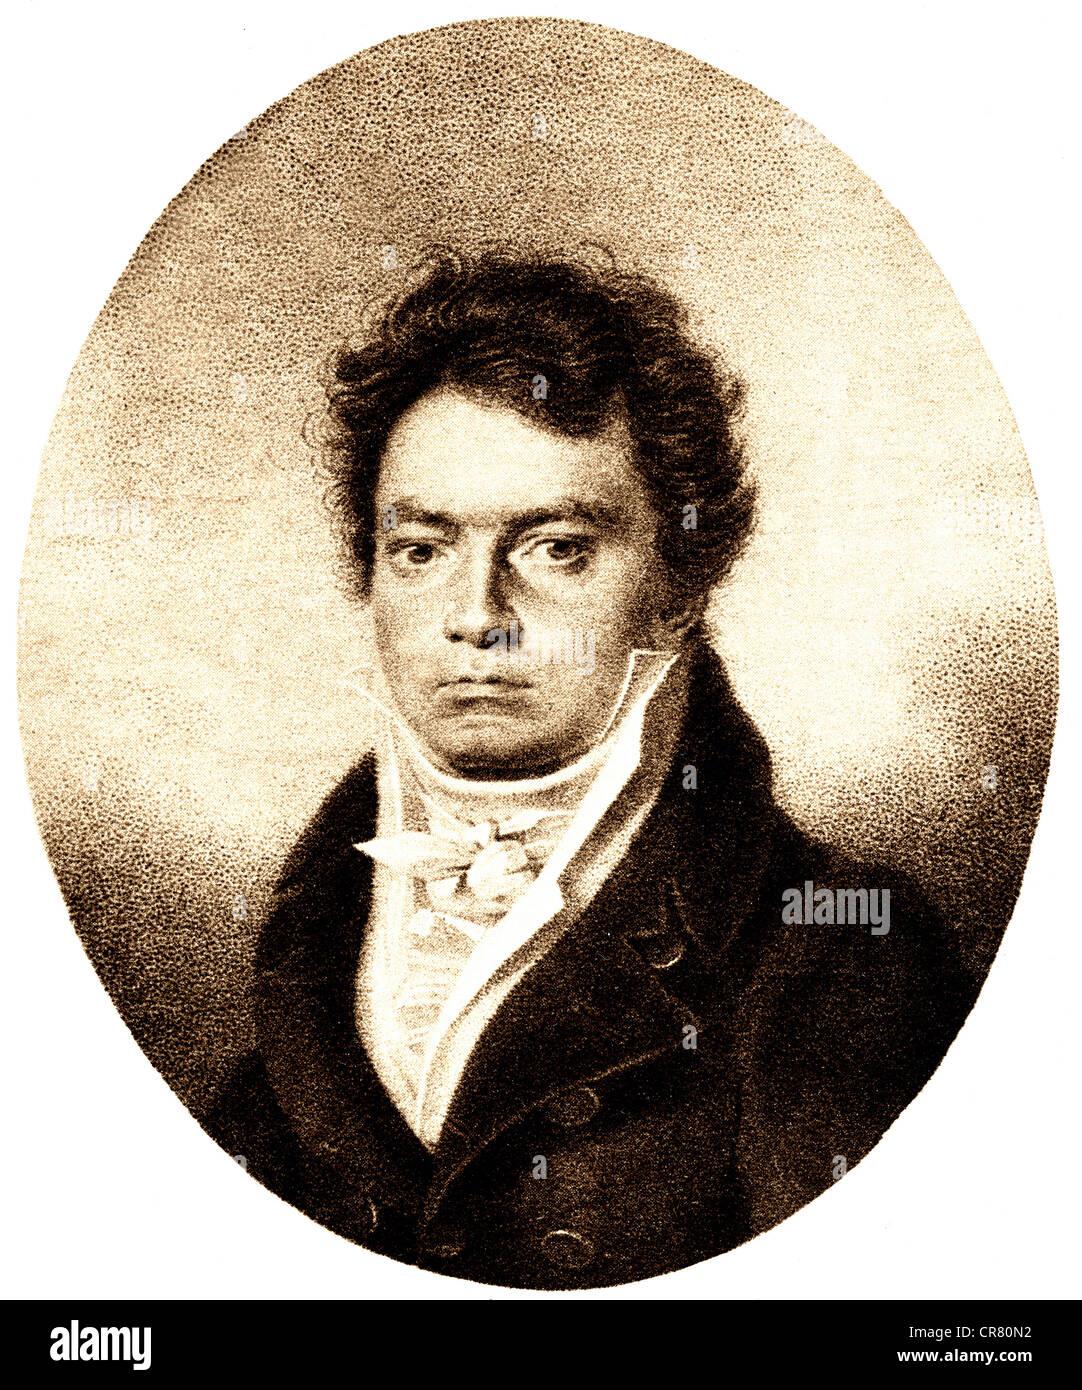 Ludwig van Beethoven in 1814, German composer, 1770 - 1827, historical illustration, 1868 - Stock Image